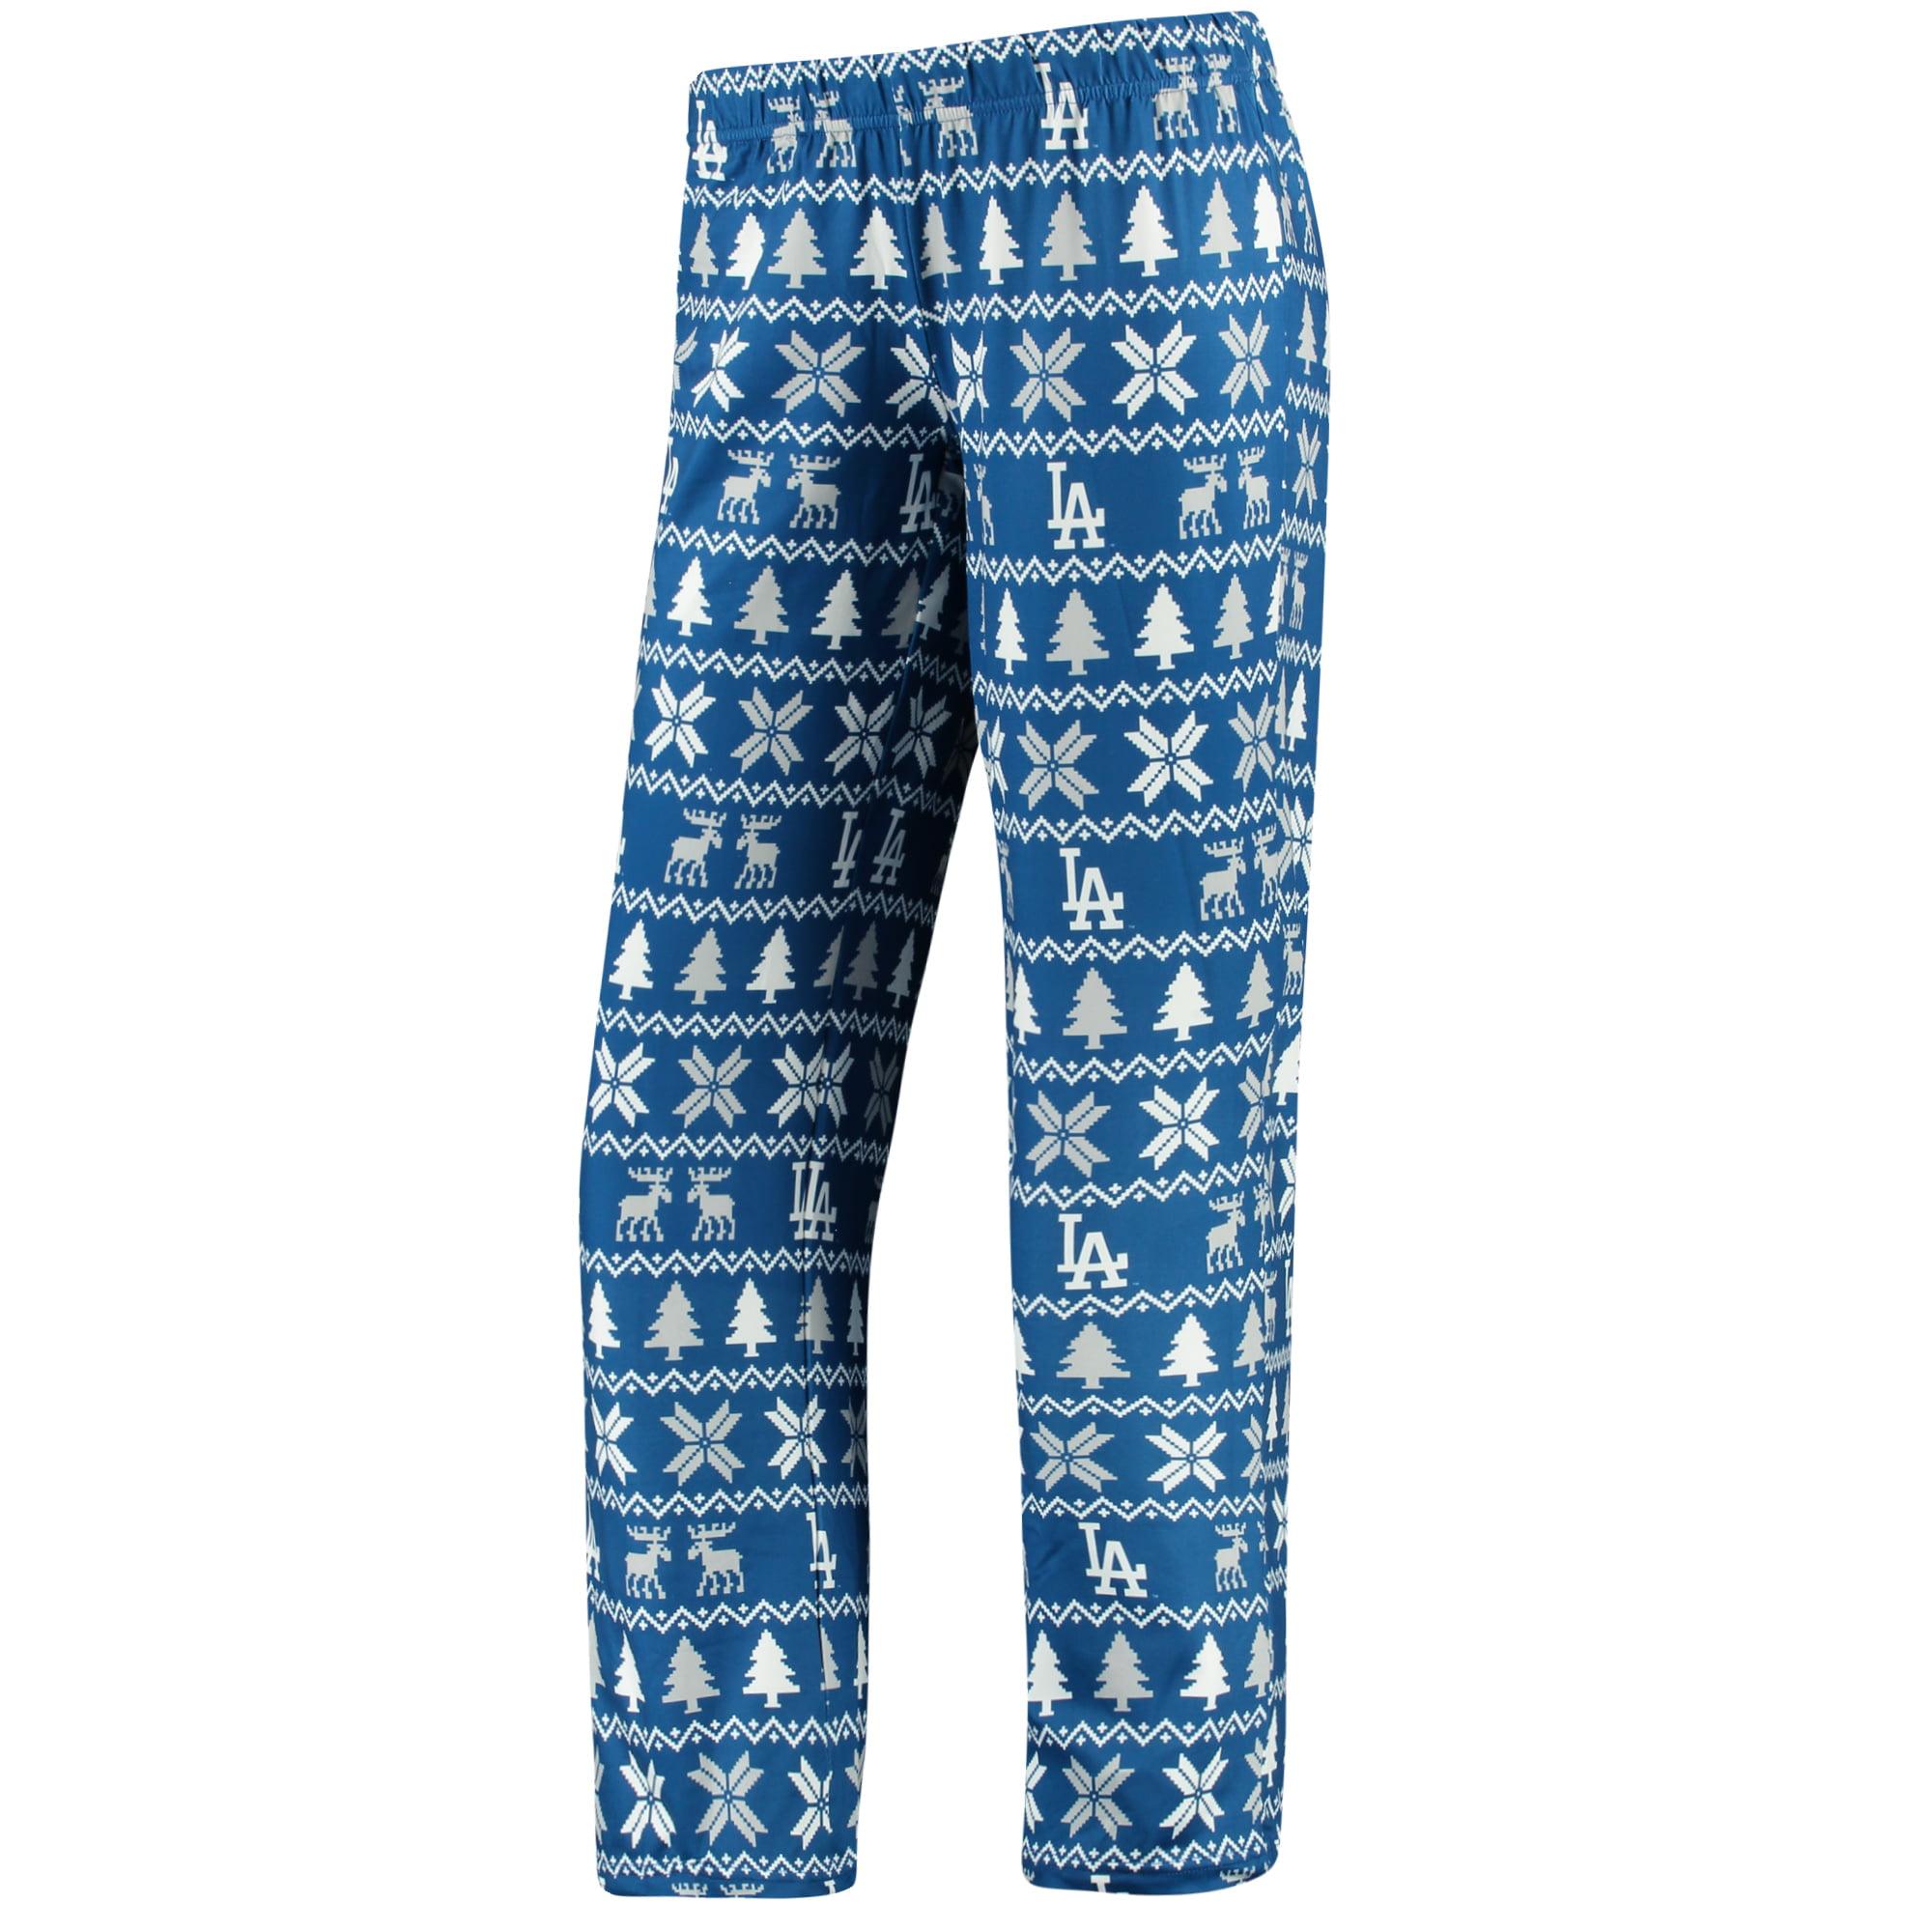 Los Angeles Dodgers Women's Holiday Print Pant - Royal